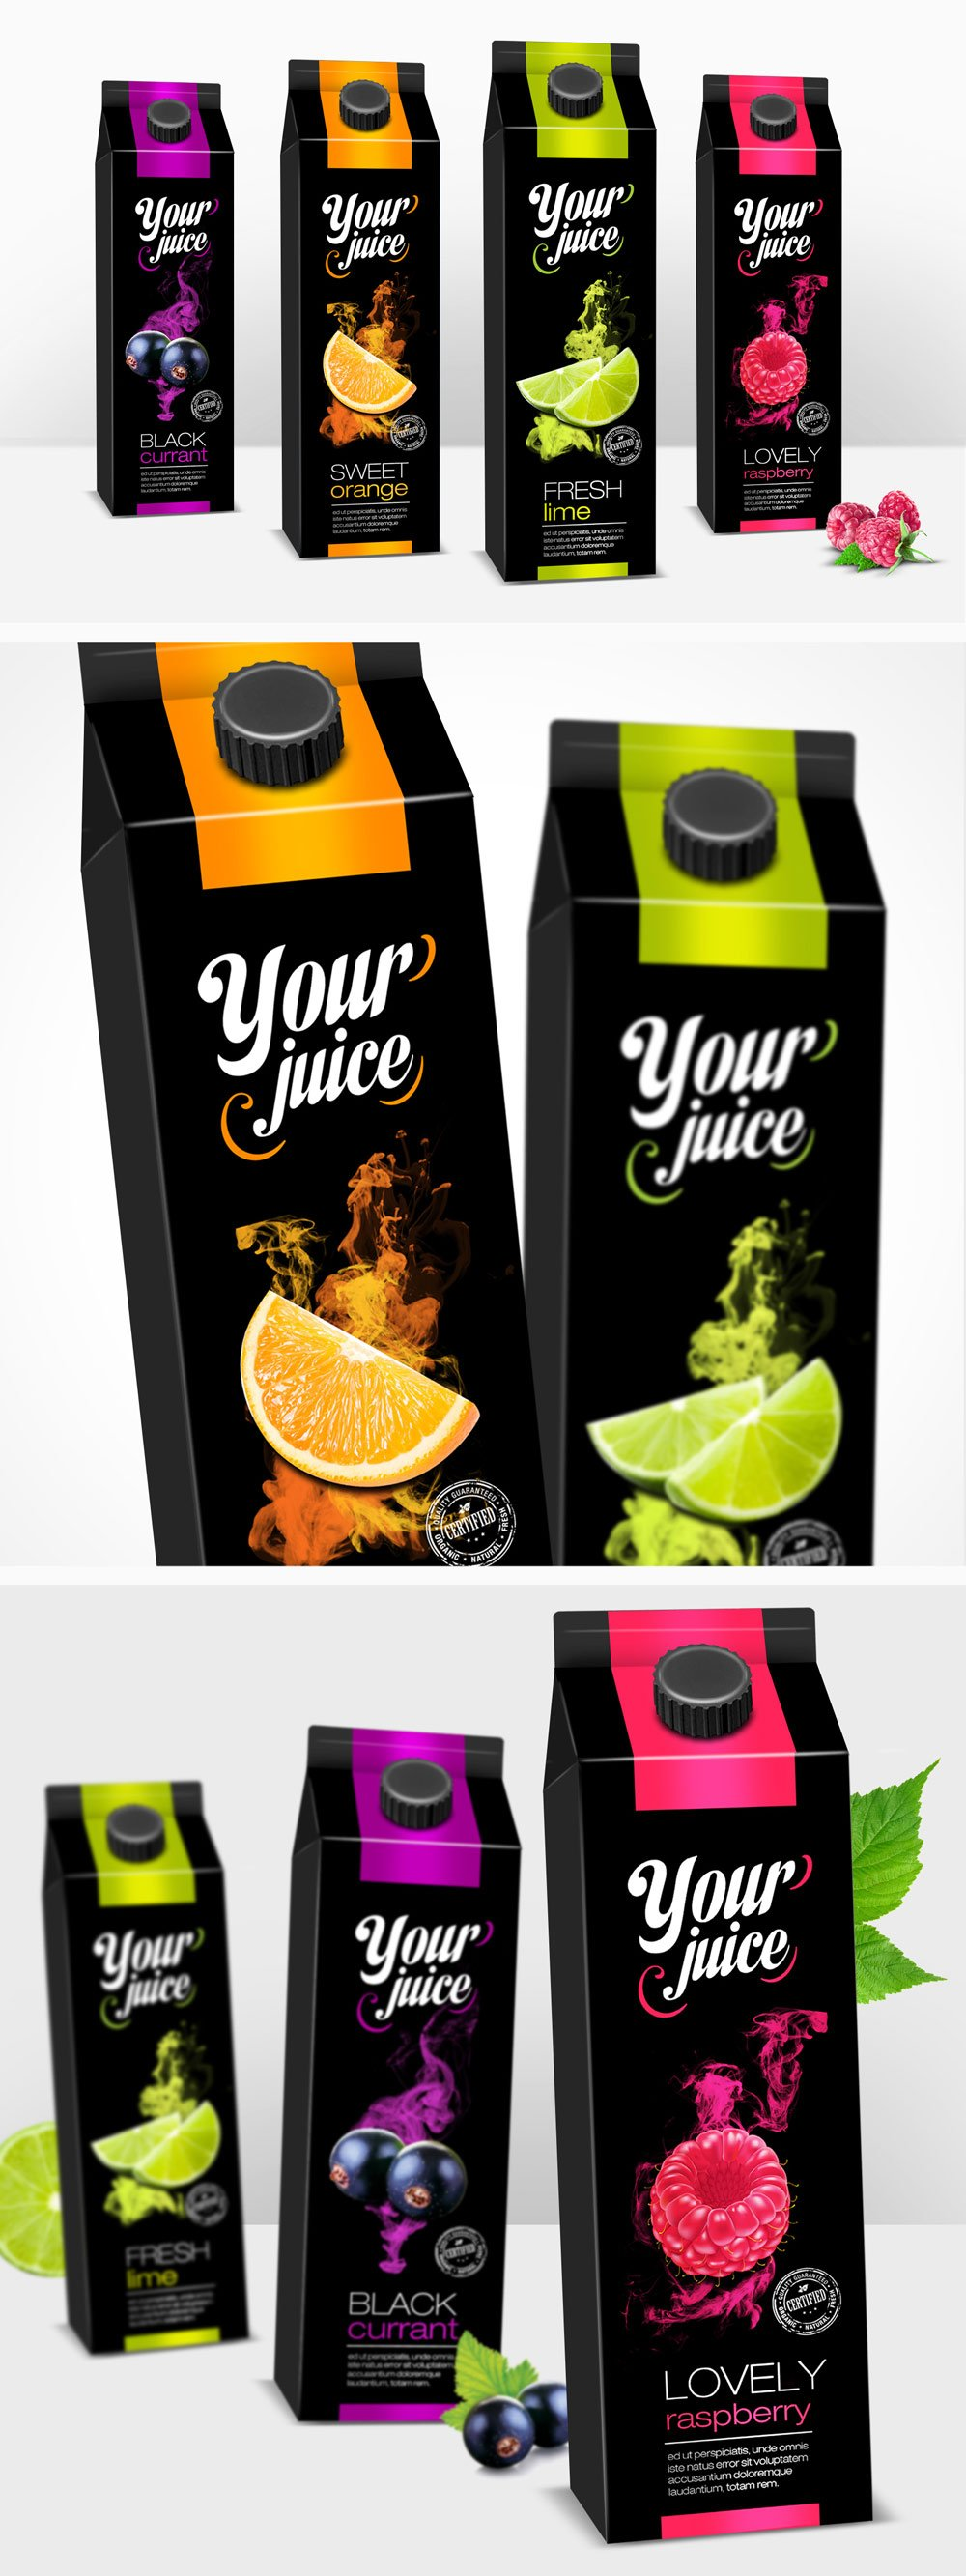 Your Juice